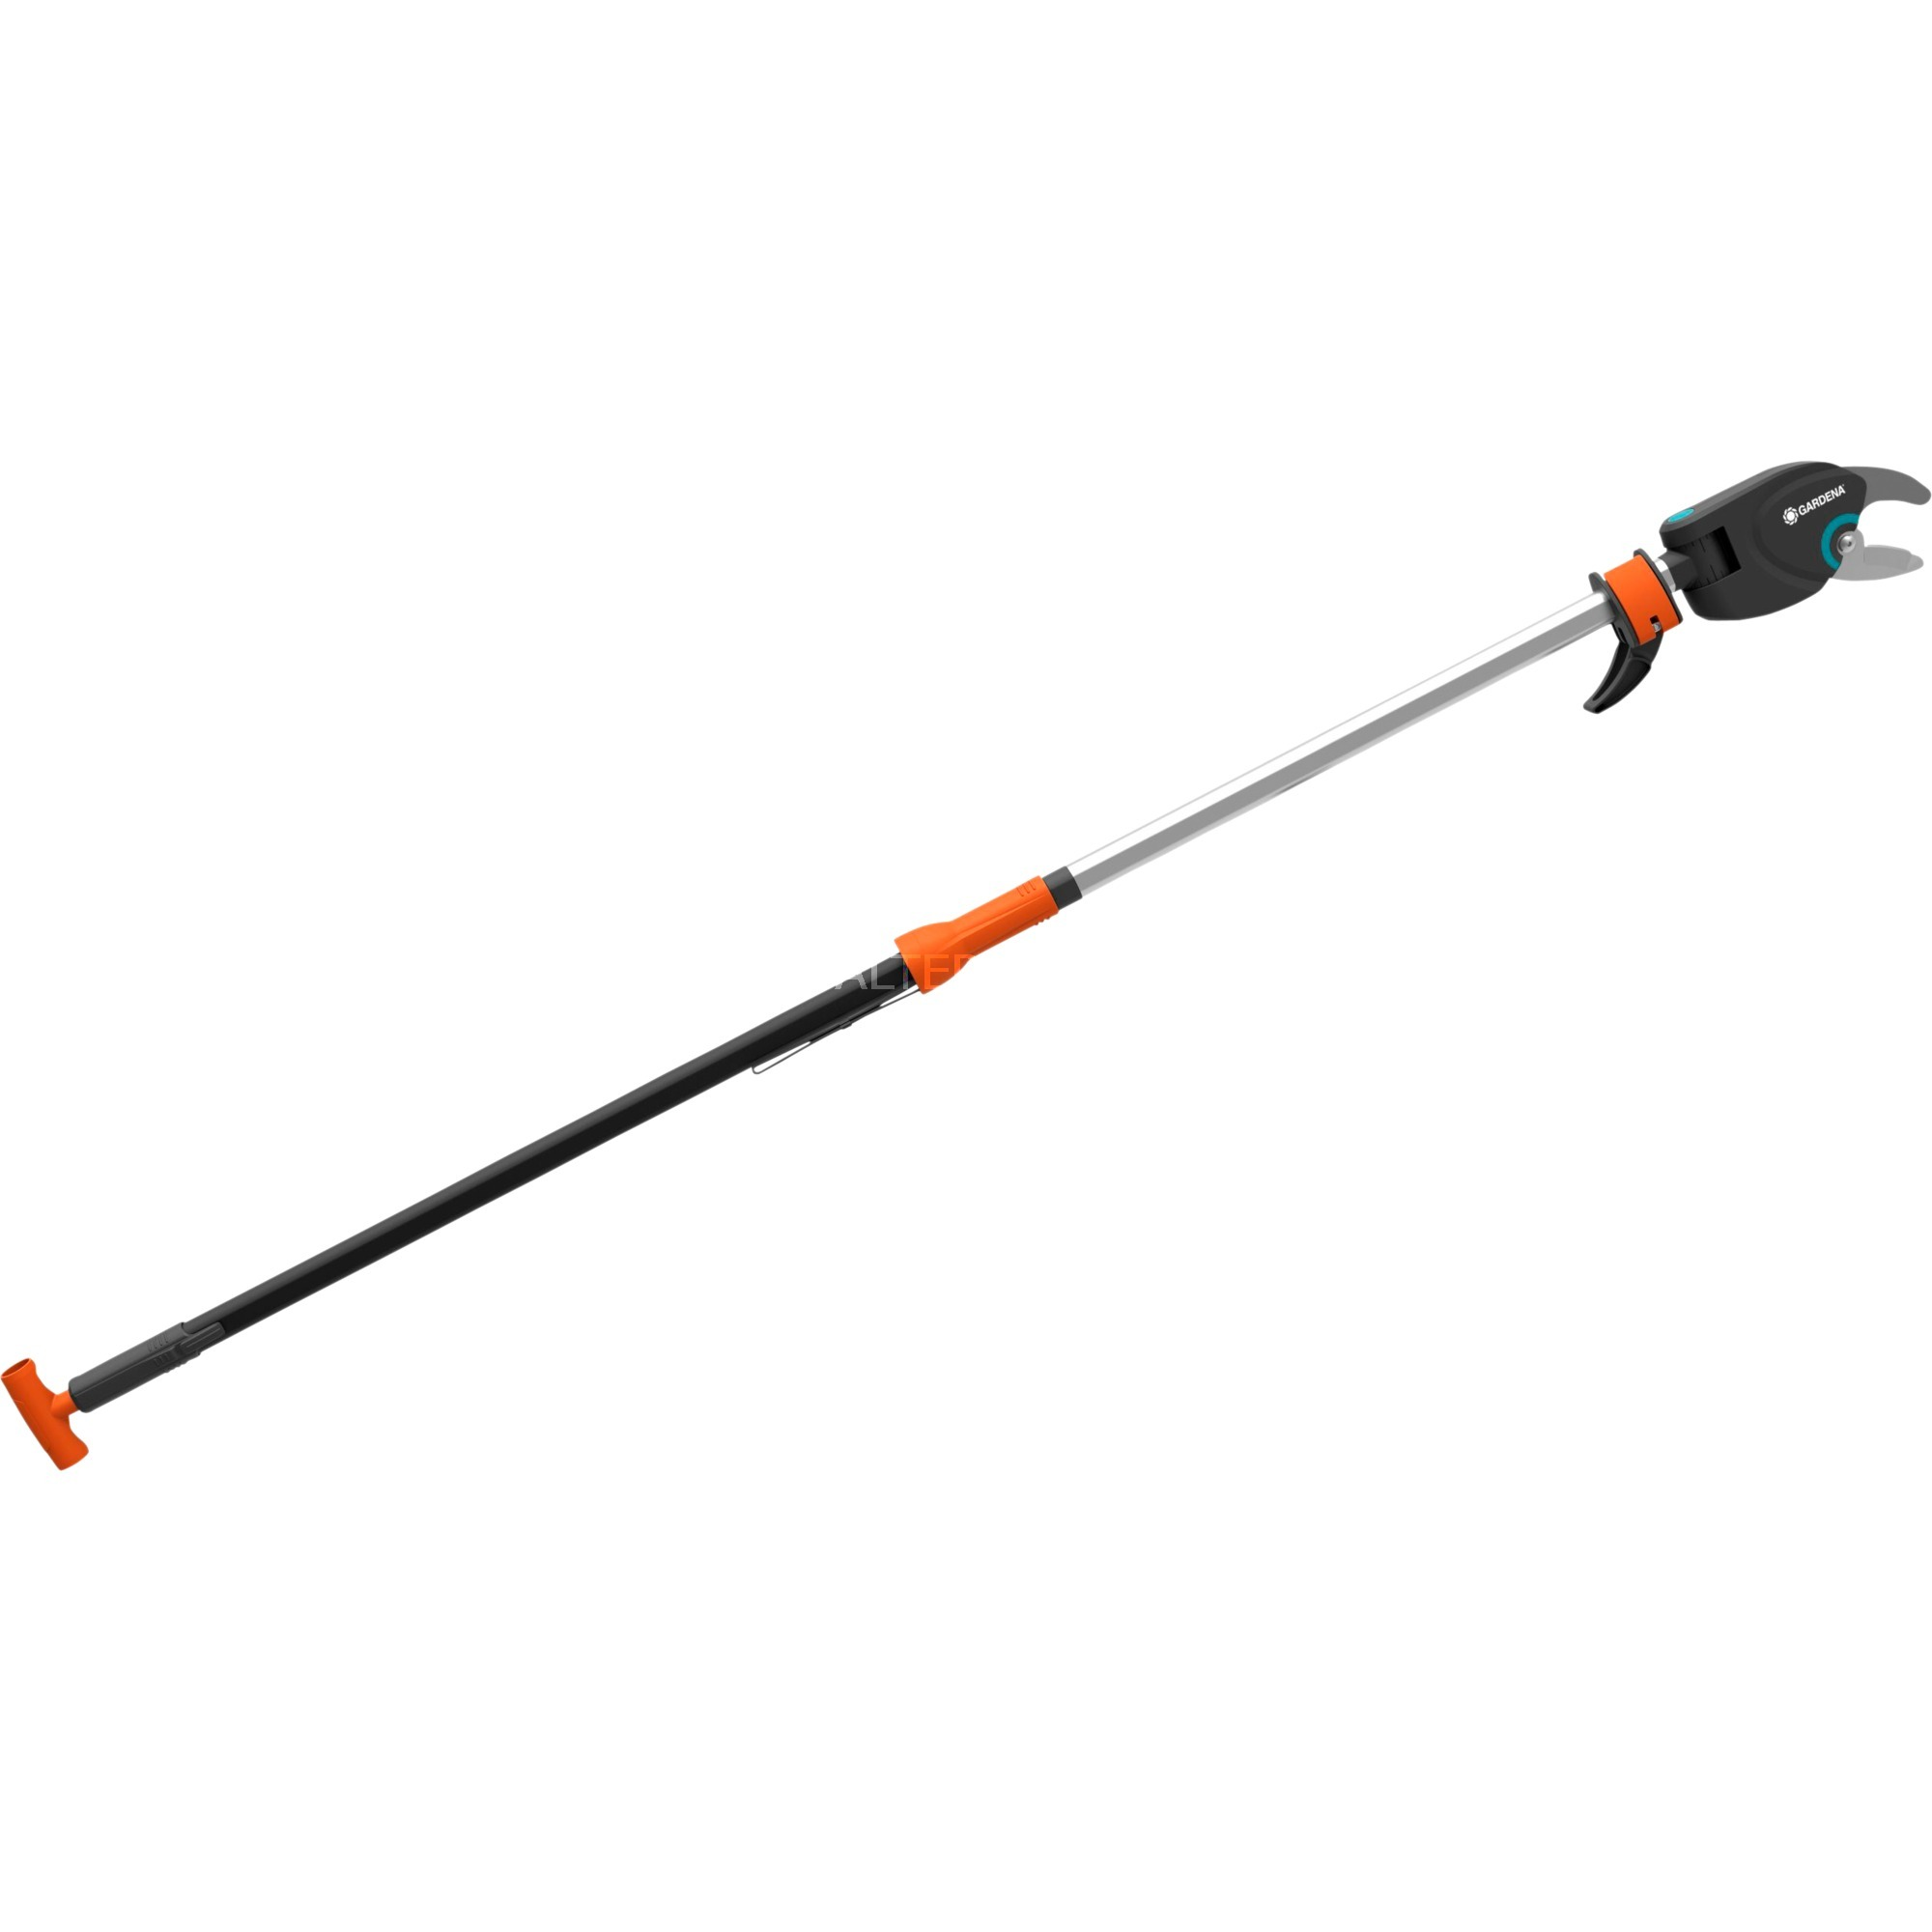 12000-20 tijeras de podar Evitar Negro / Naranja